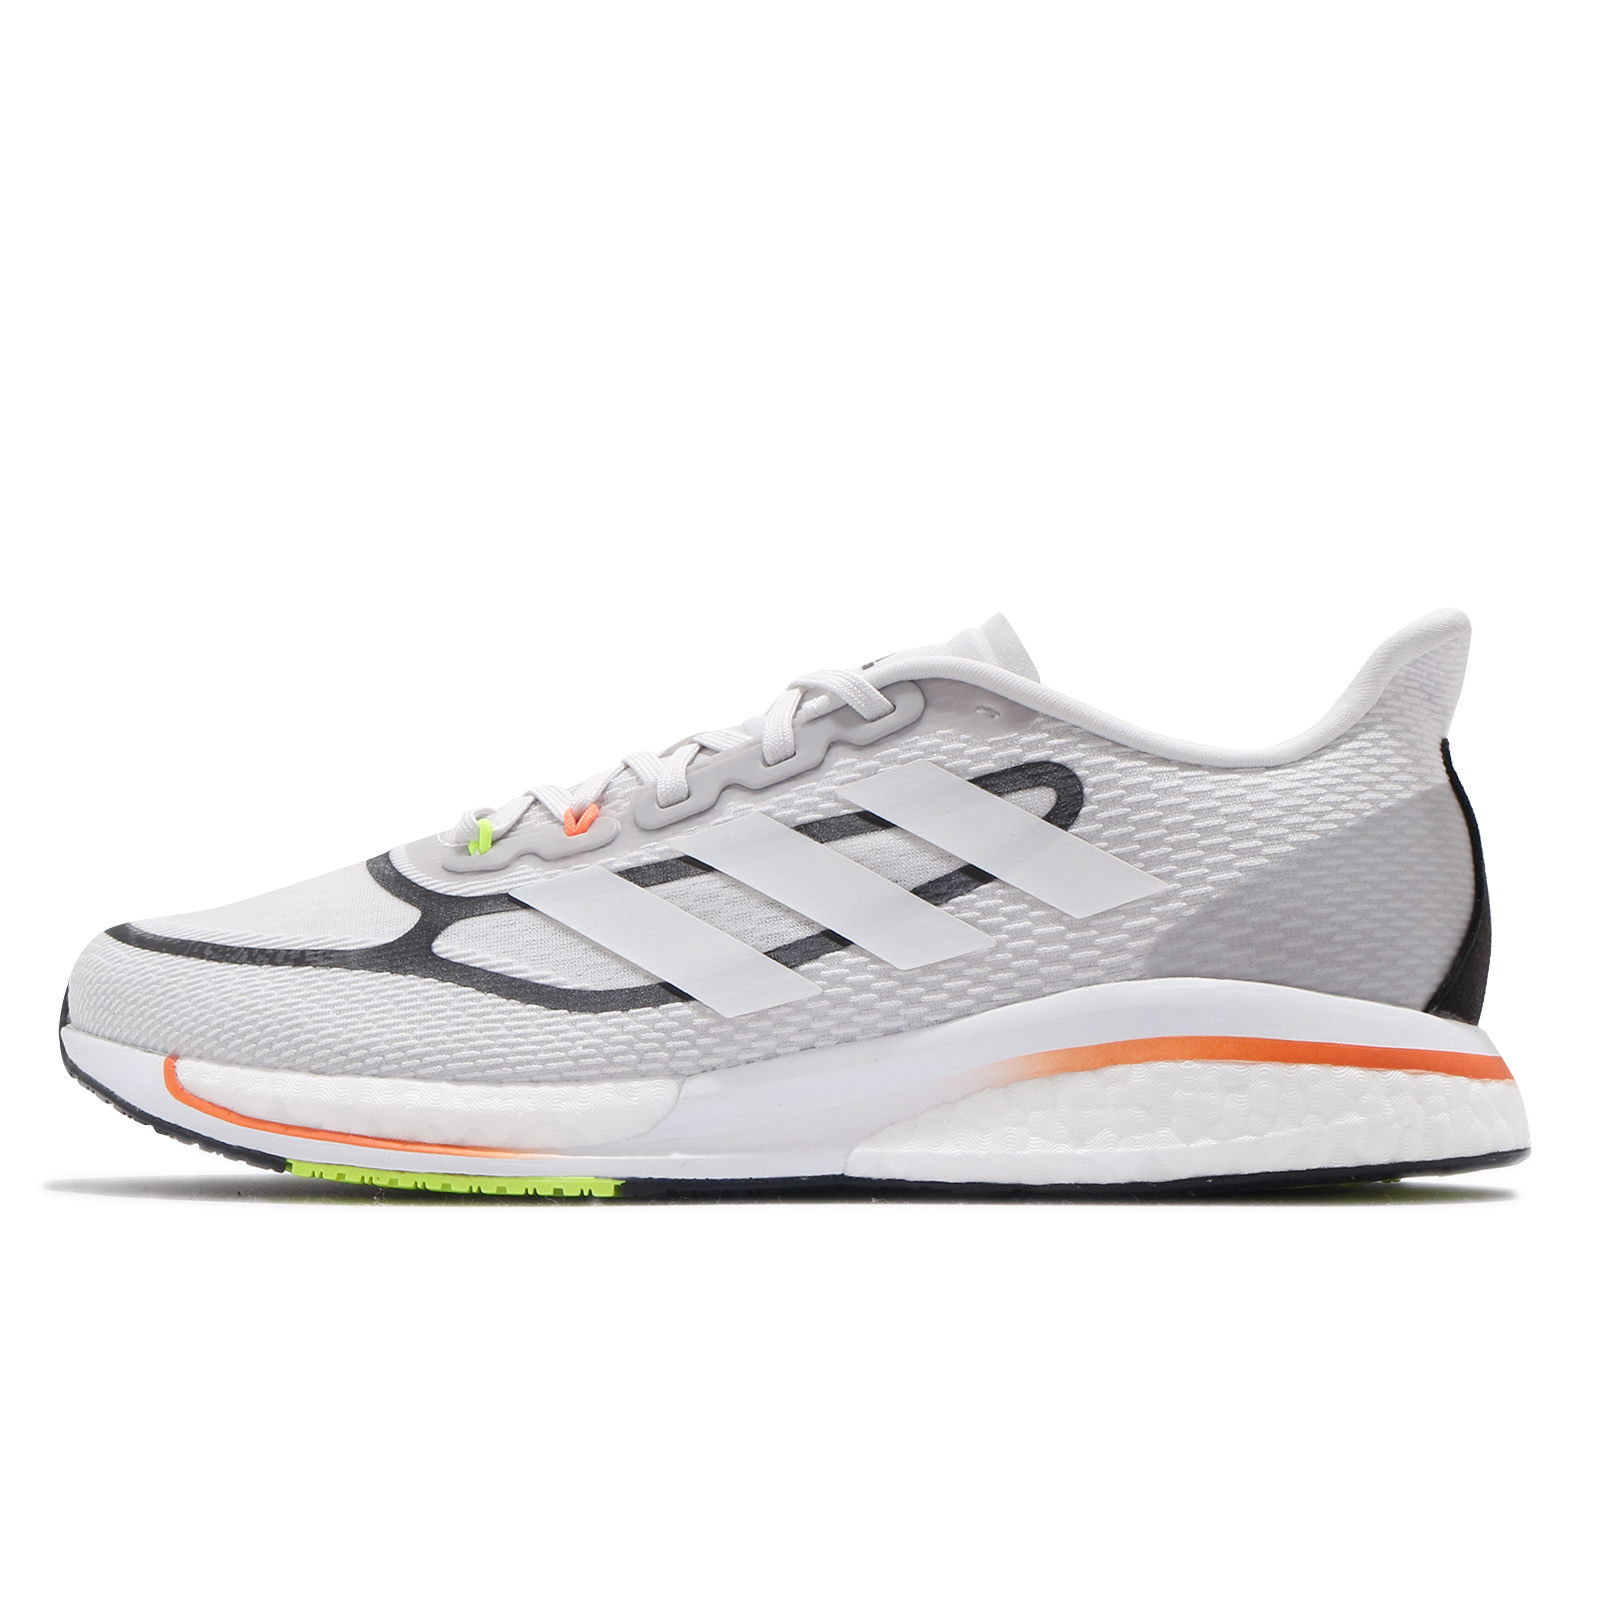 adidas 慢跑鞋 Supernova Plus M 灰 白 橘 綠 男鞋 愛迪達 BOOST【ACS】 FX6651